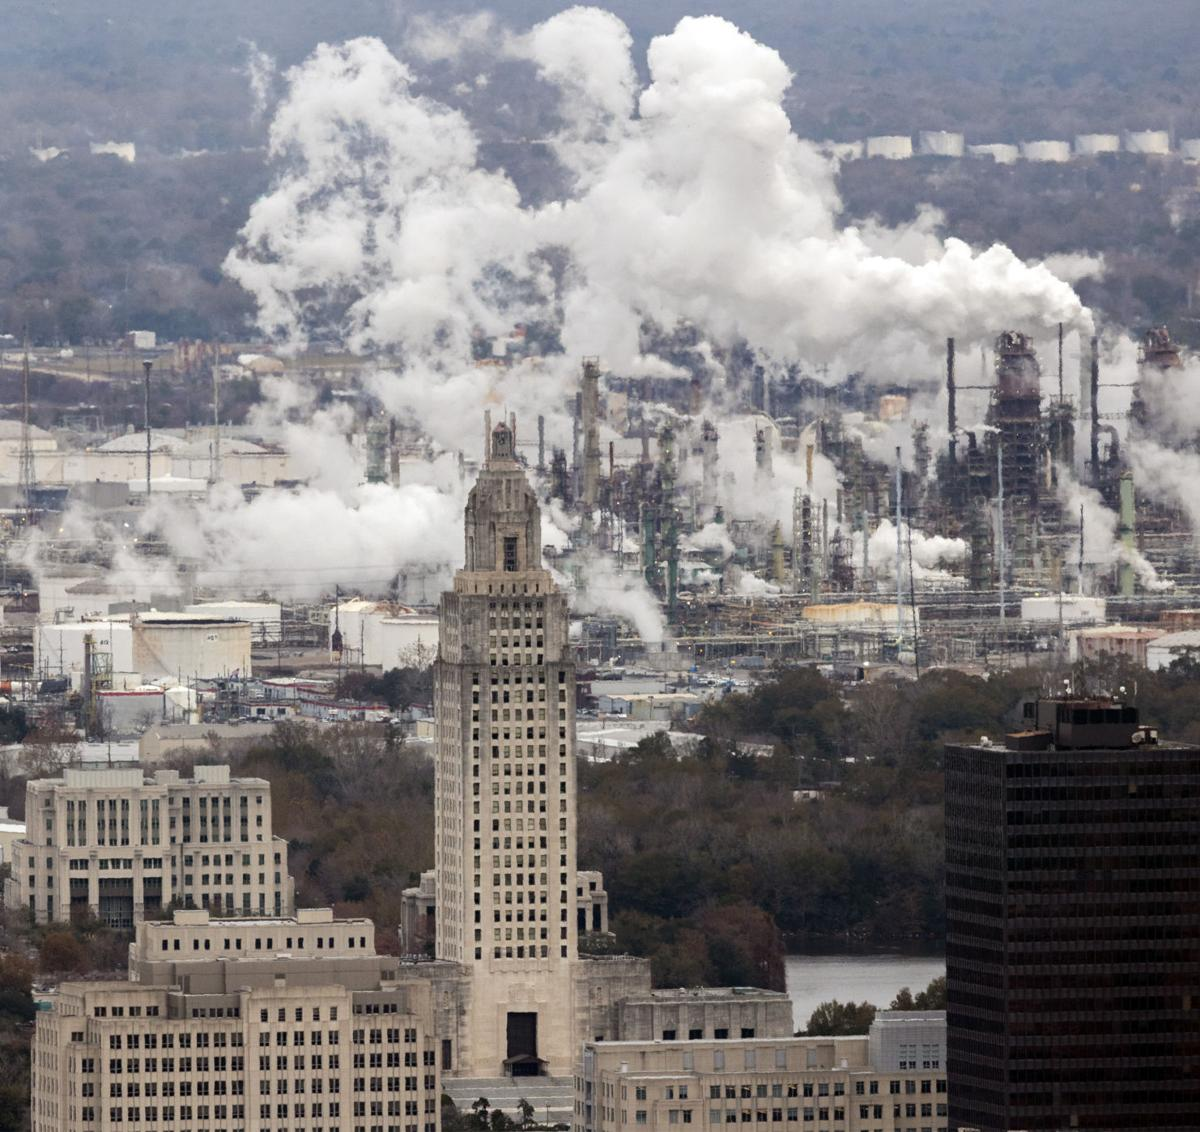 state capital exxonmobil refinery_0001.jpg